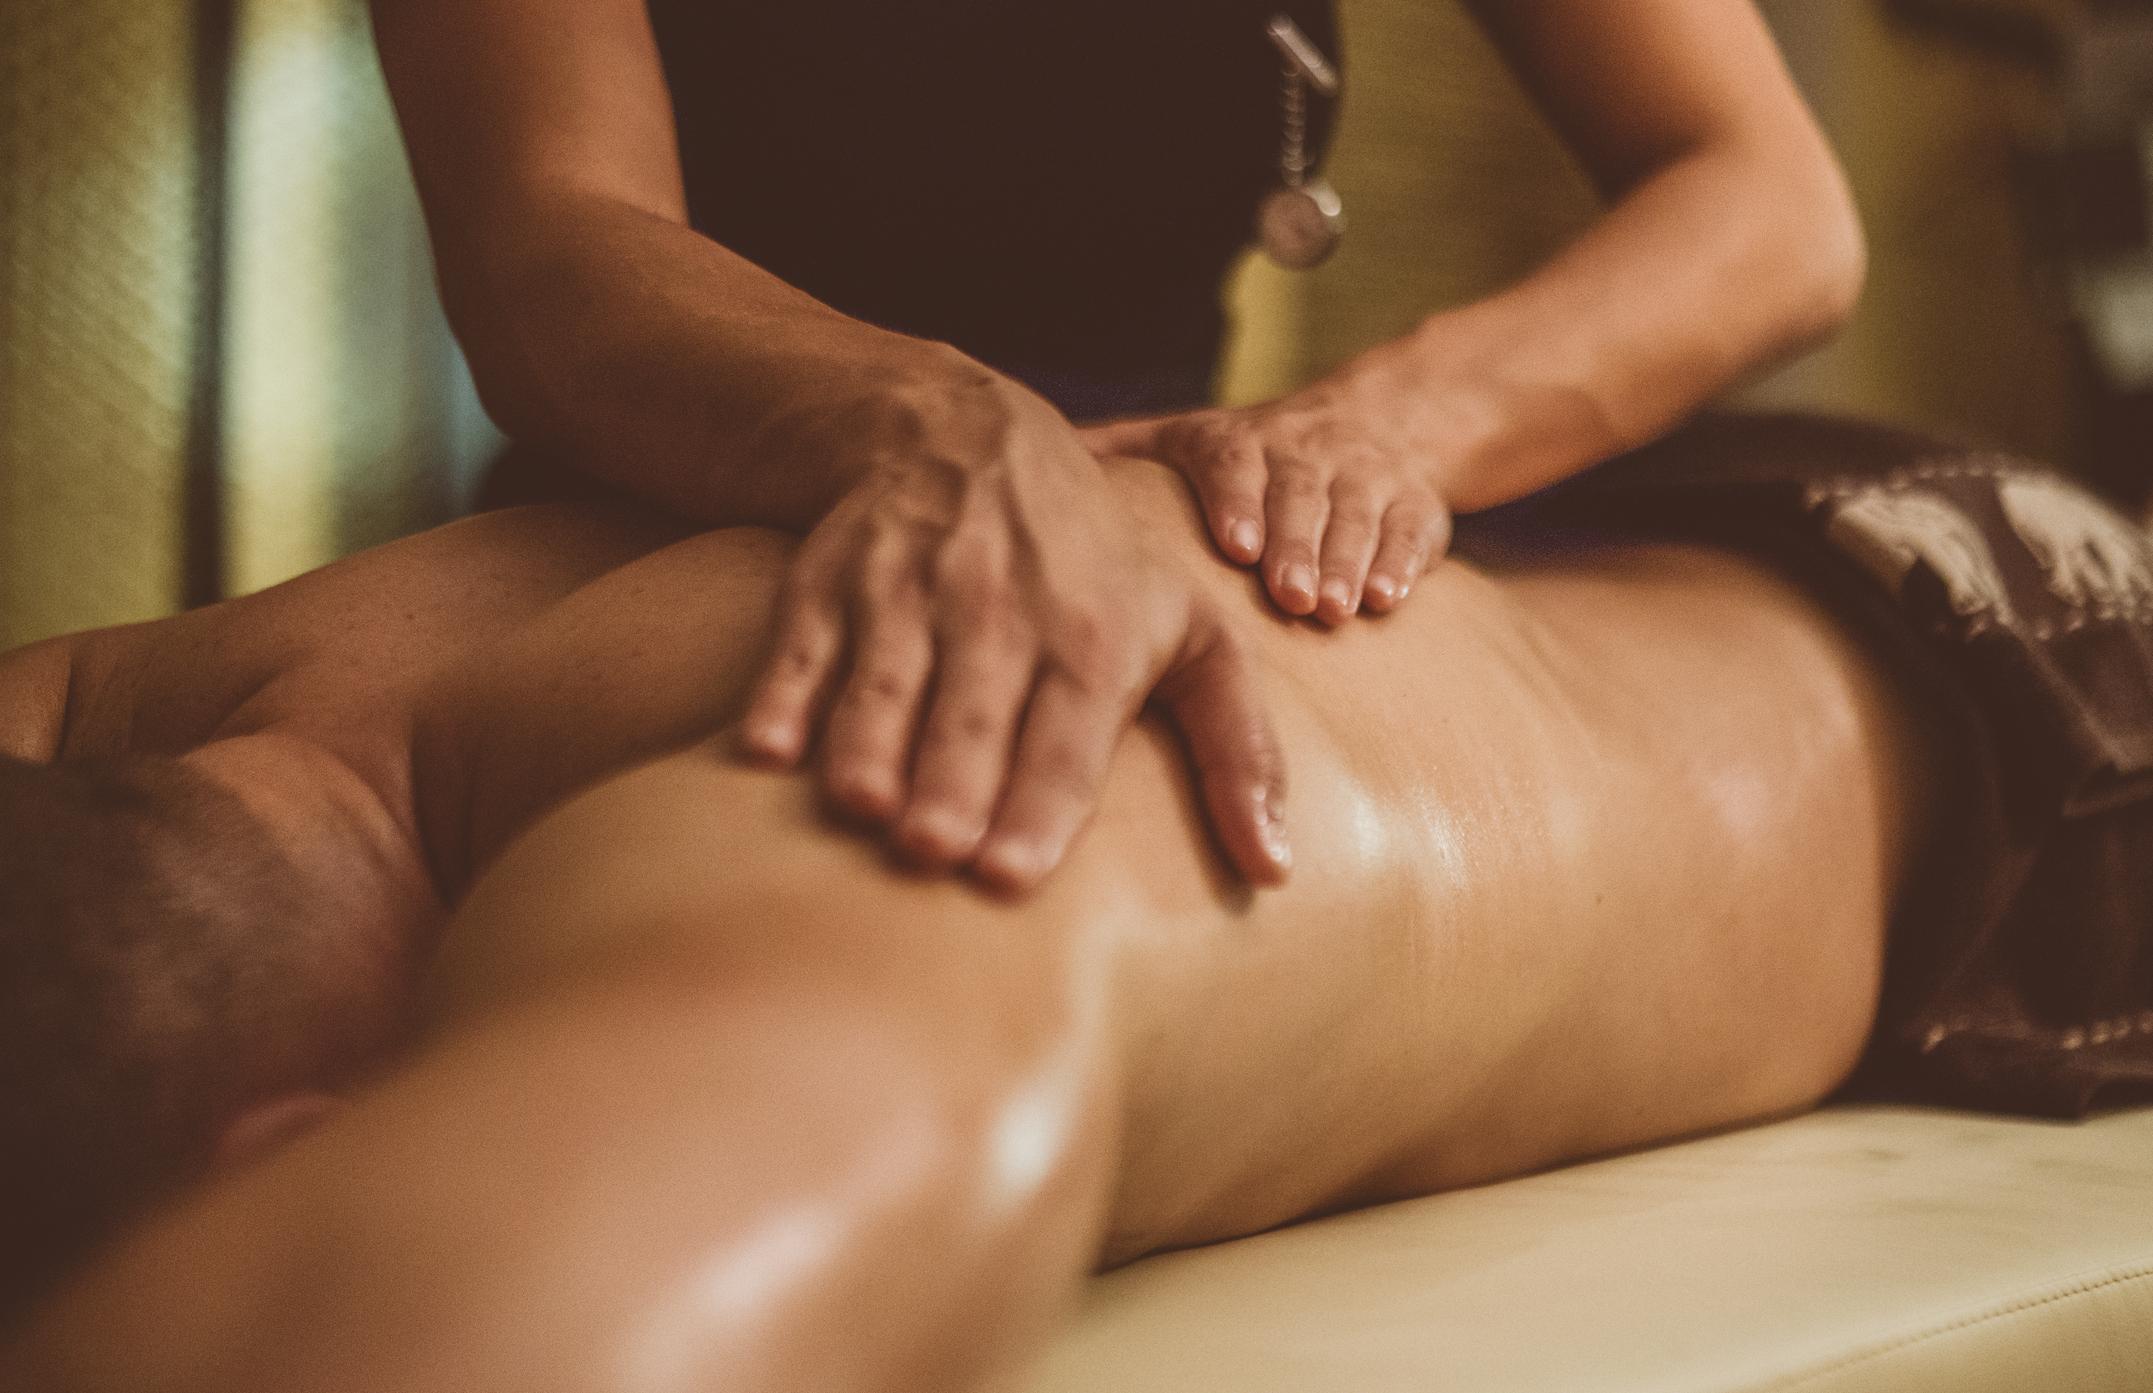 Oil-Massage-of-Male-Torso-614533078_2156x1395.jpeg